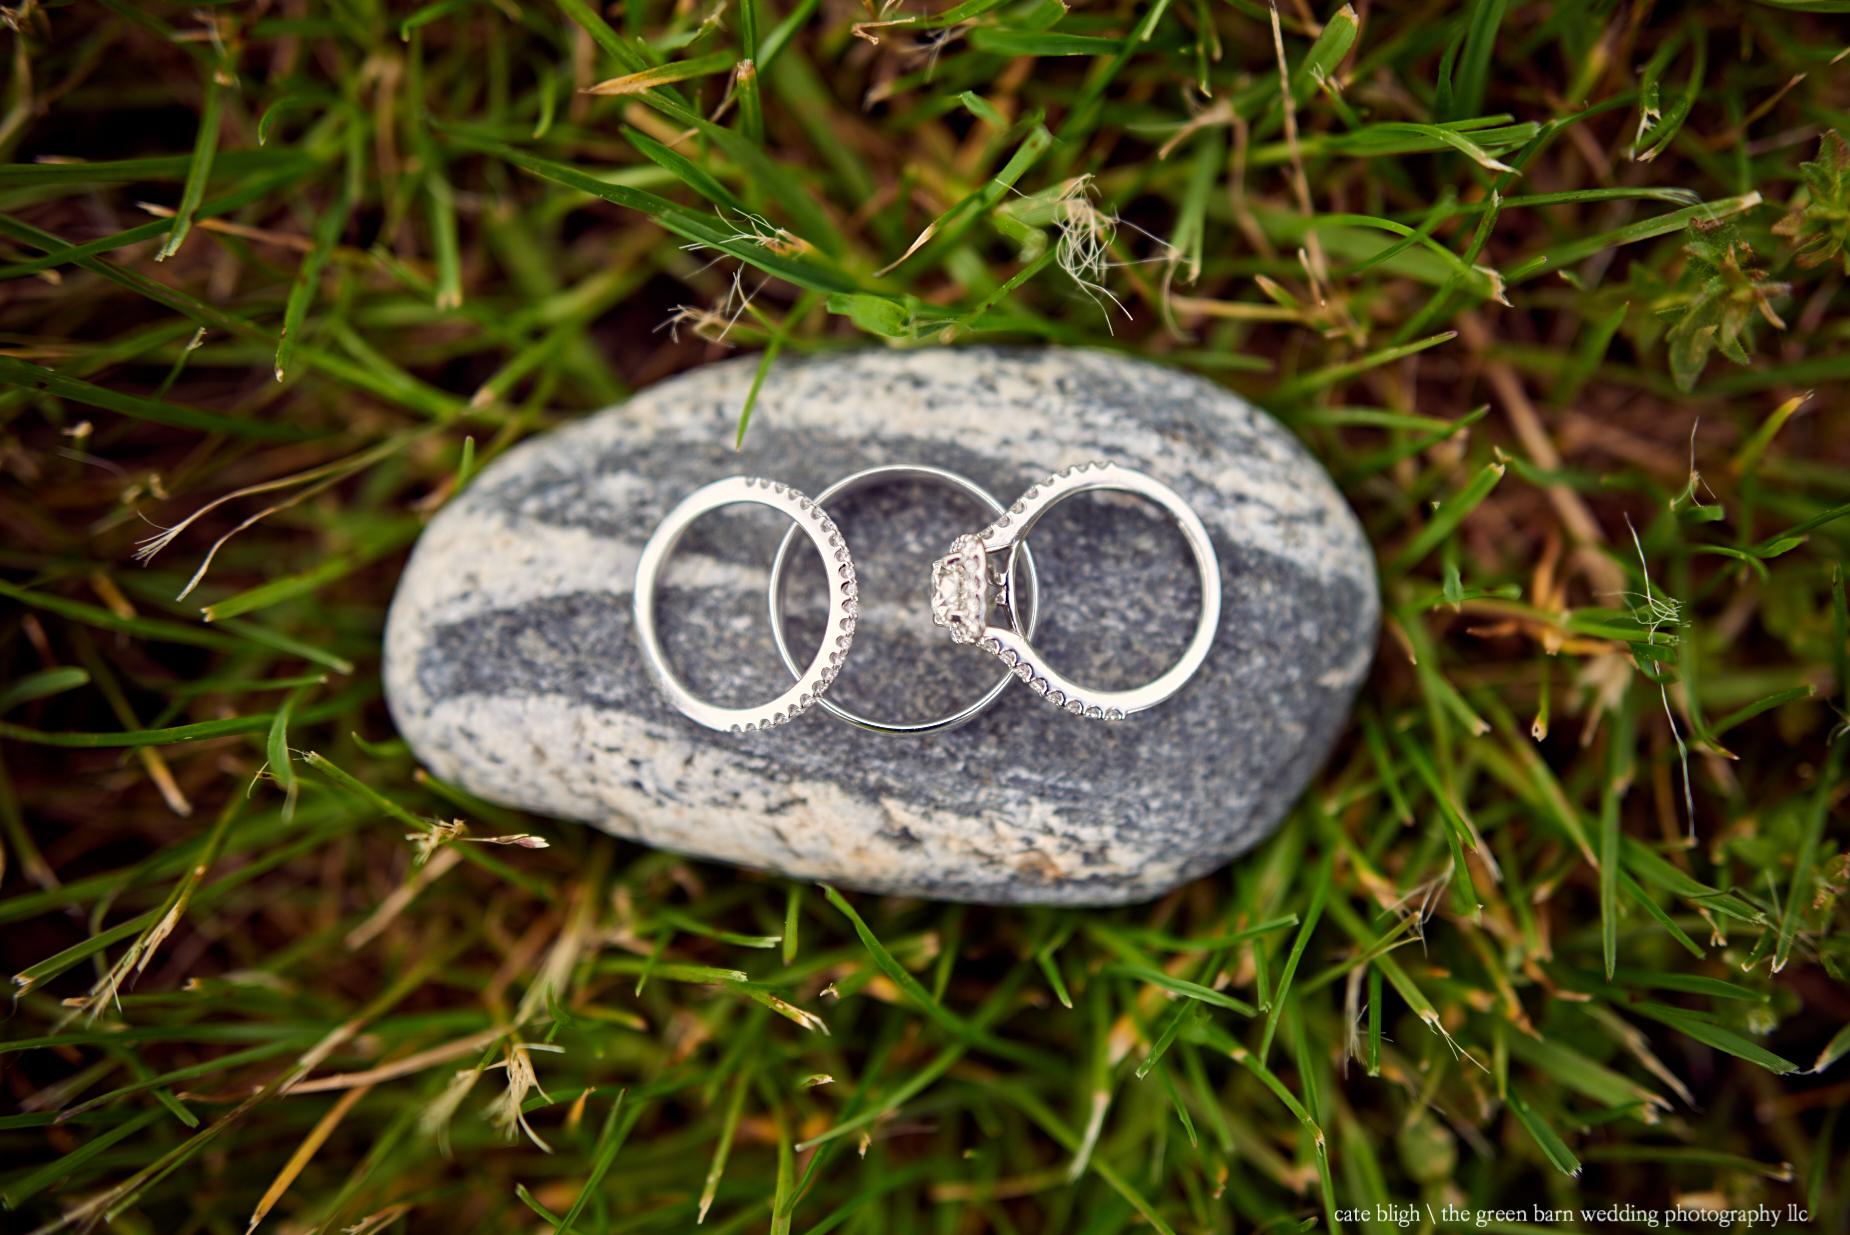 Wedding rings on smooth rock seacoast wedding inspiration